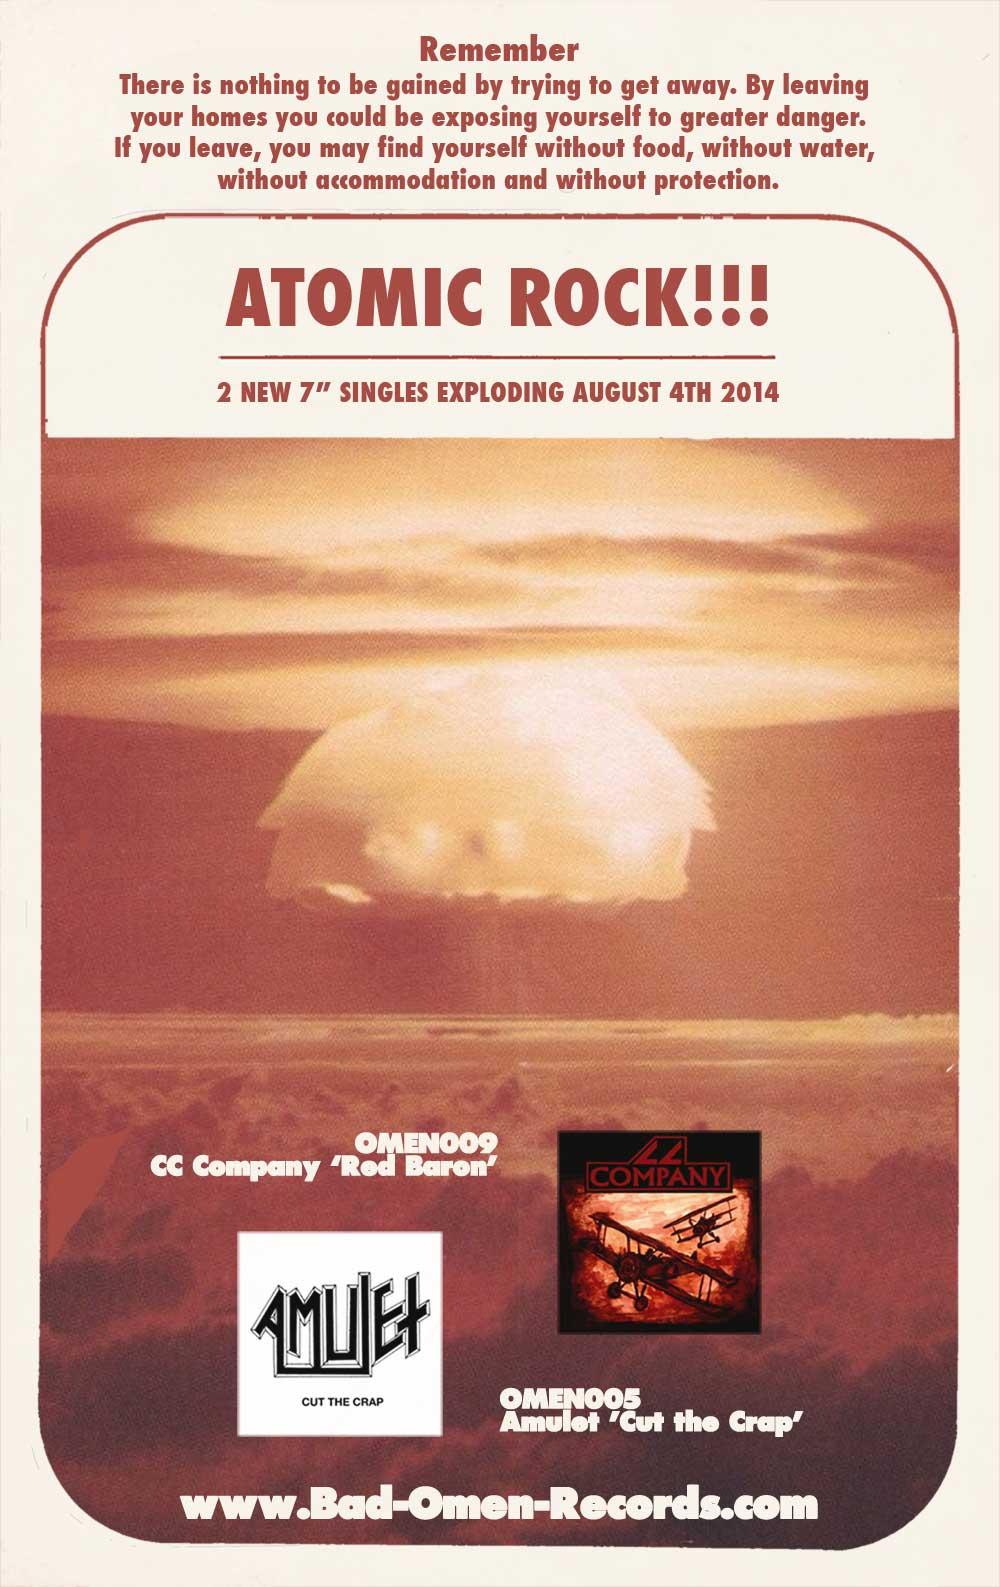 Atomic-rockfosite